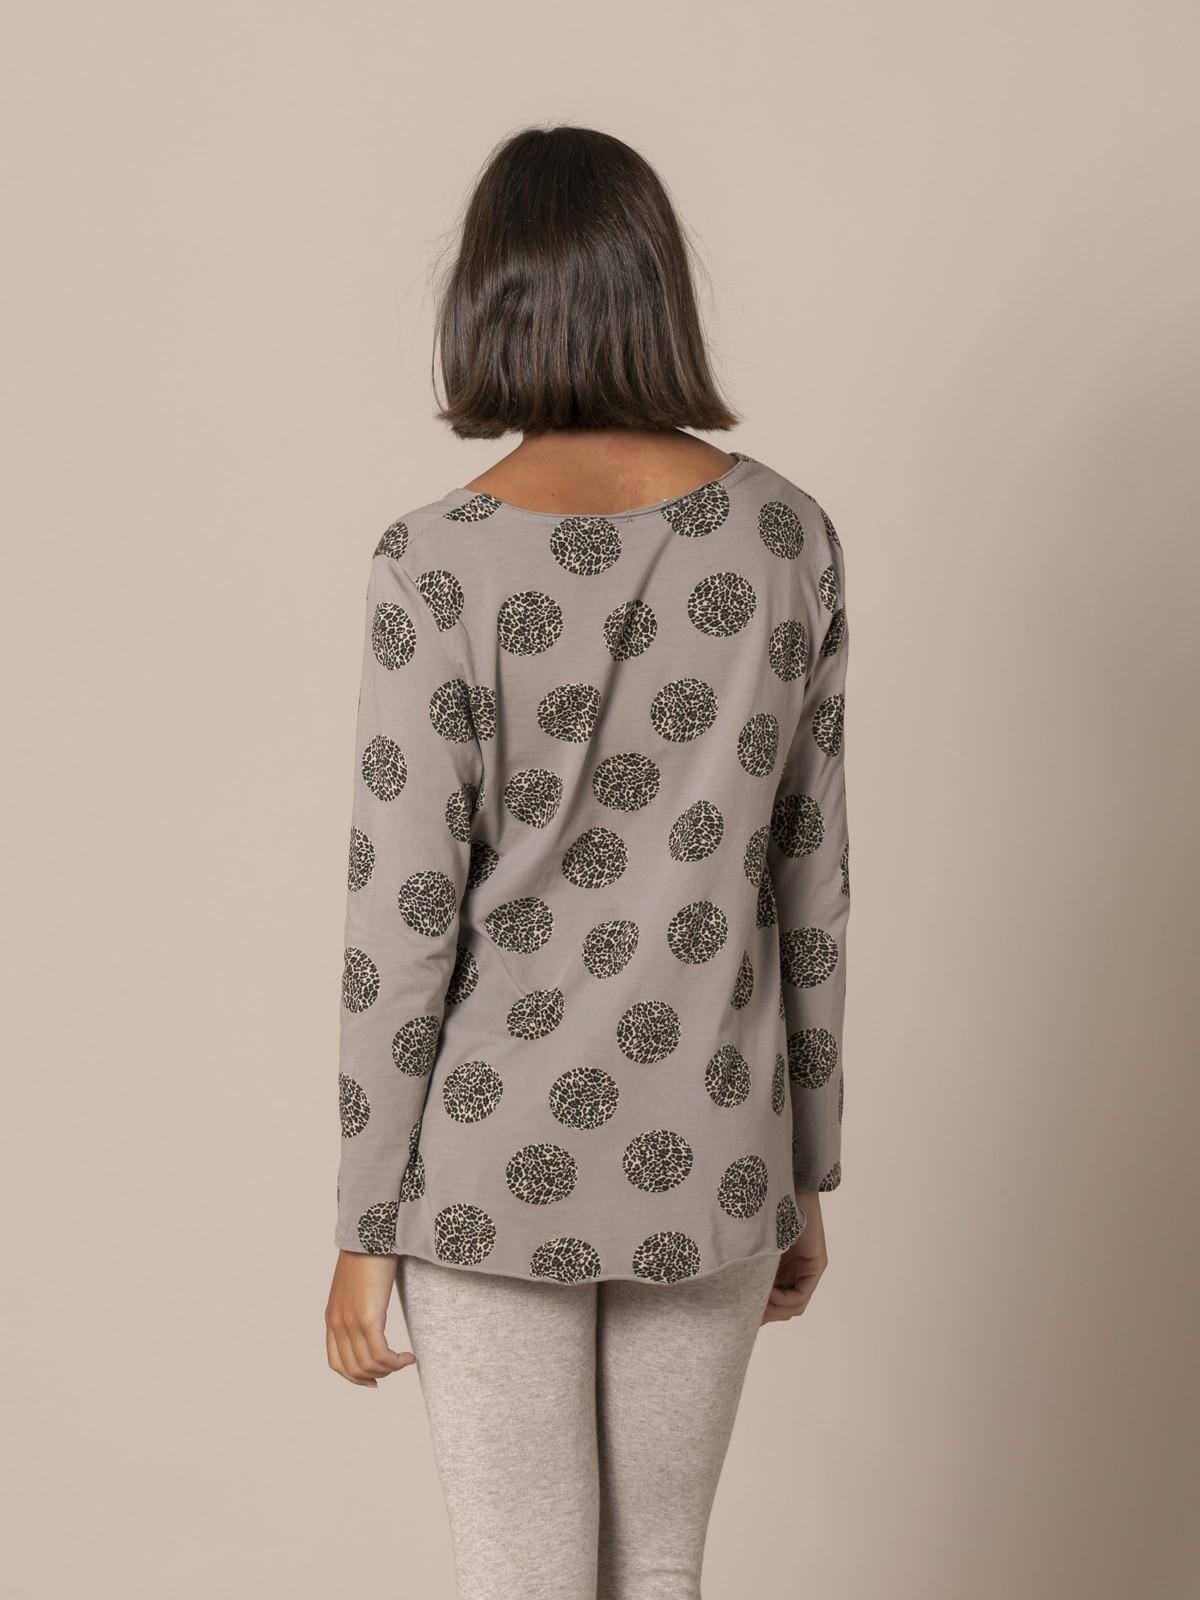 Camiseta mujer animal print fantastic Piedra